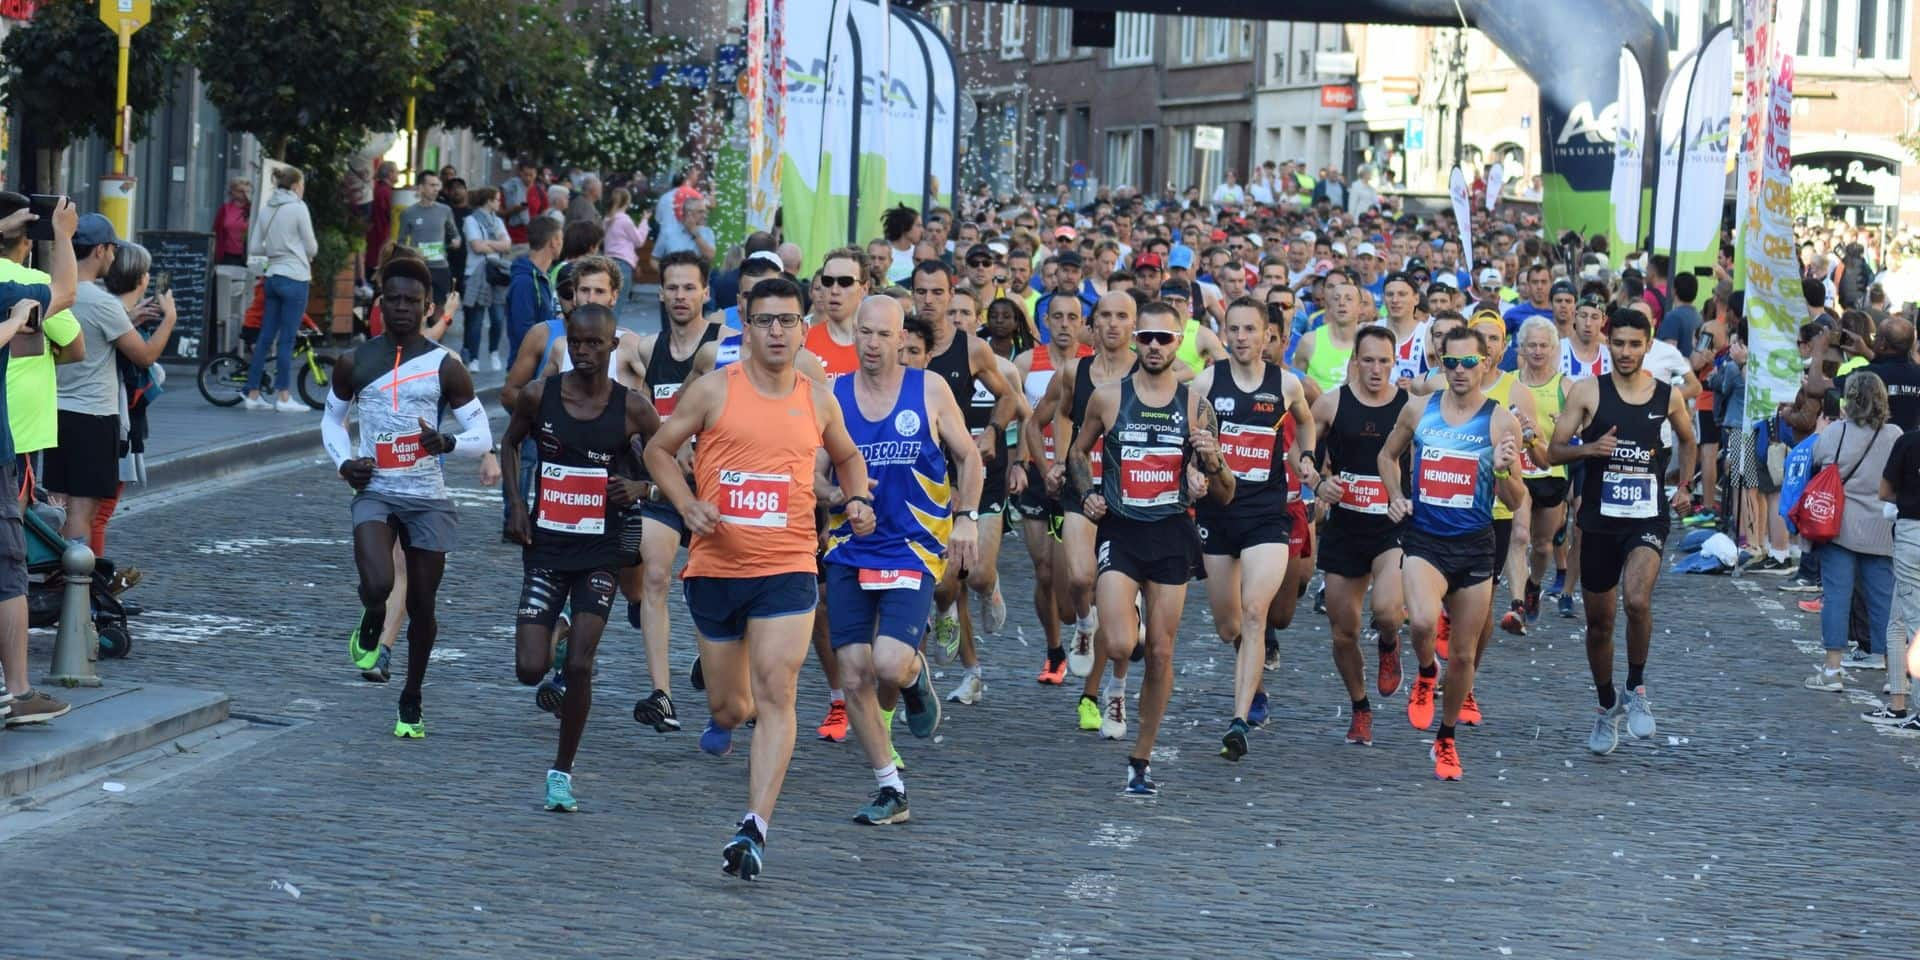 Officiel: pas de semi-marathon de Nivelles en 2020